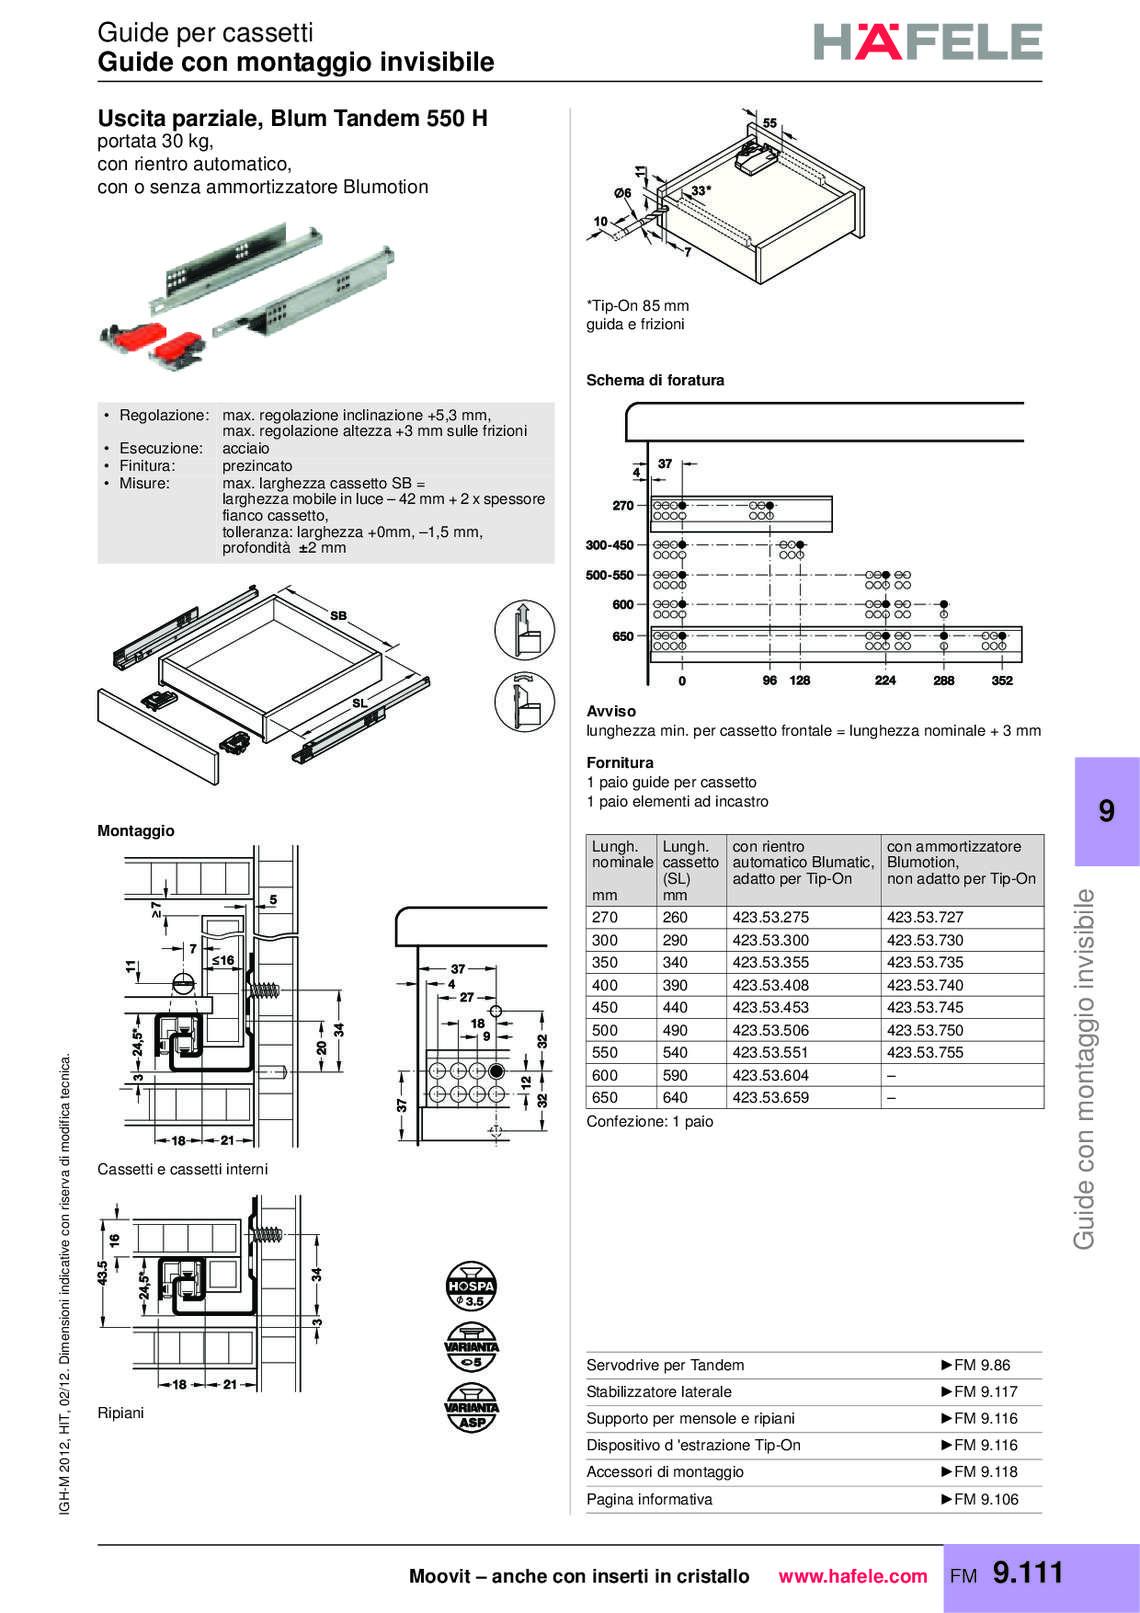 hafele-spondine-e-guide-per-mobili_40_158.jpg